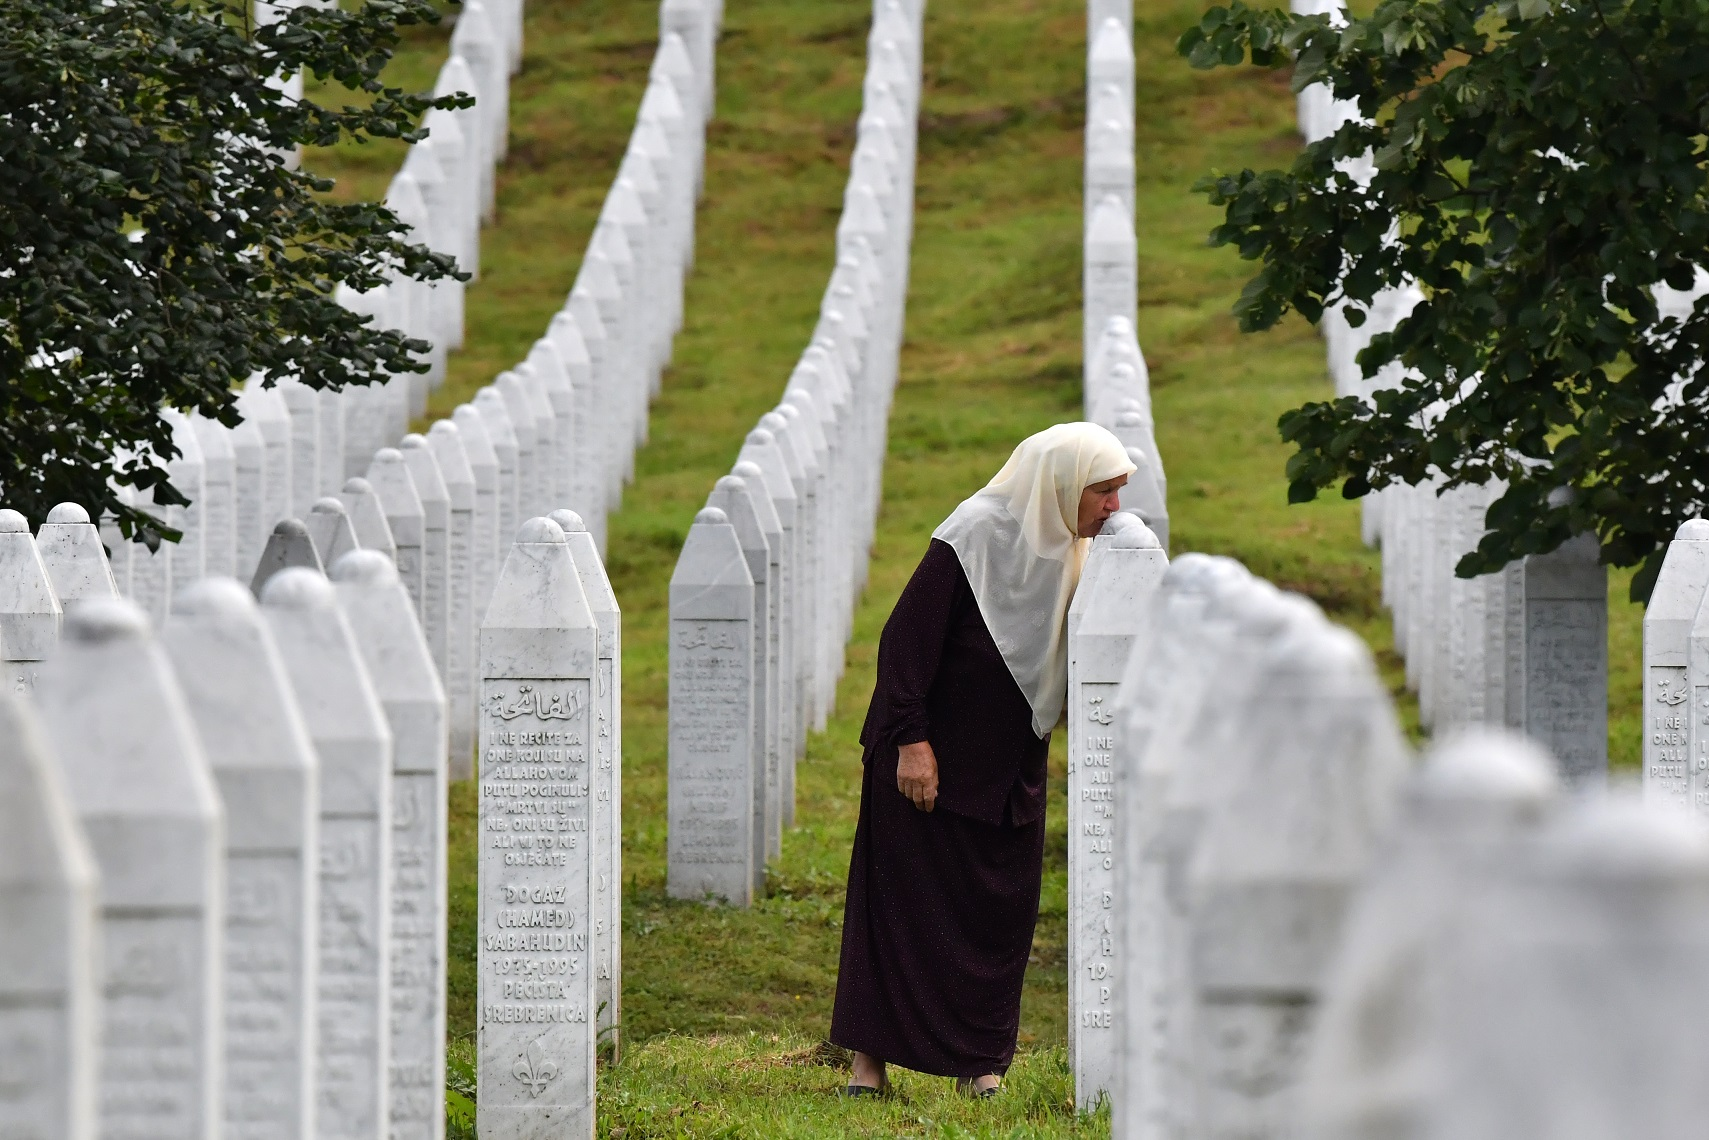 (Foto: ELVIS BARUKCIC / AFP)